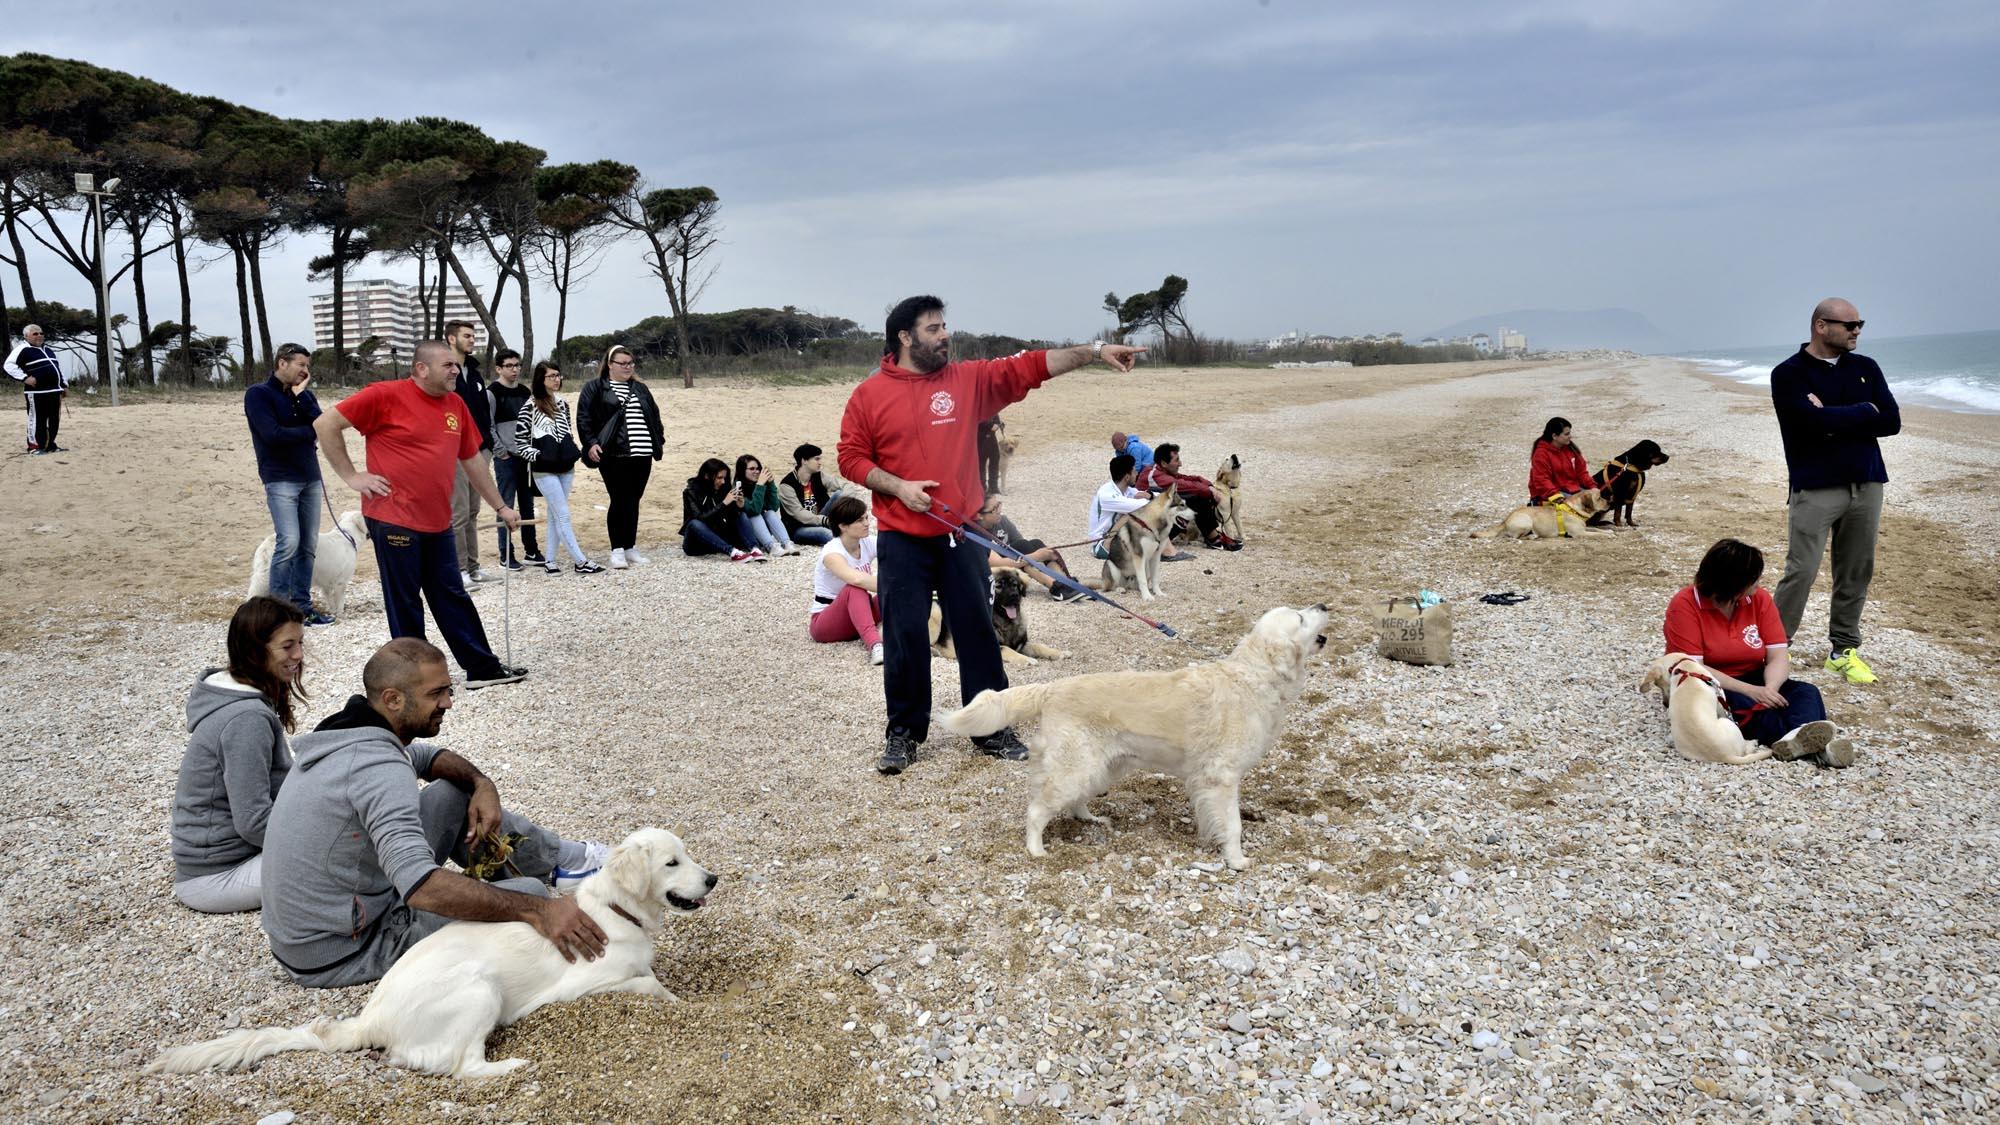 0106 addestramento cani soccorso cinofilo 1 - Soccorso cinofilo Pegasus